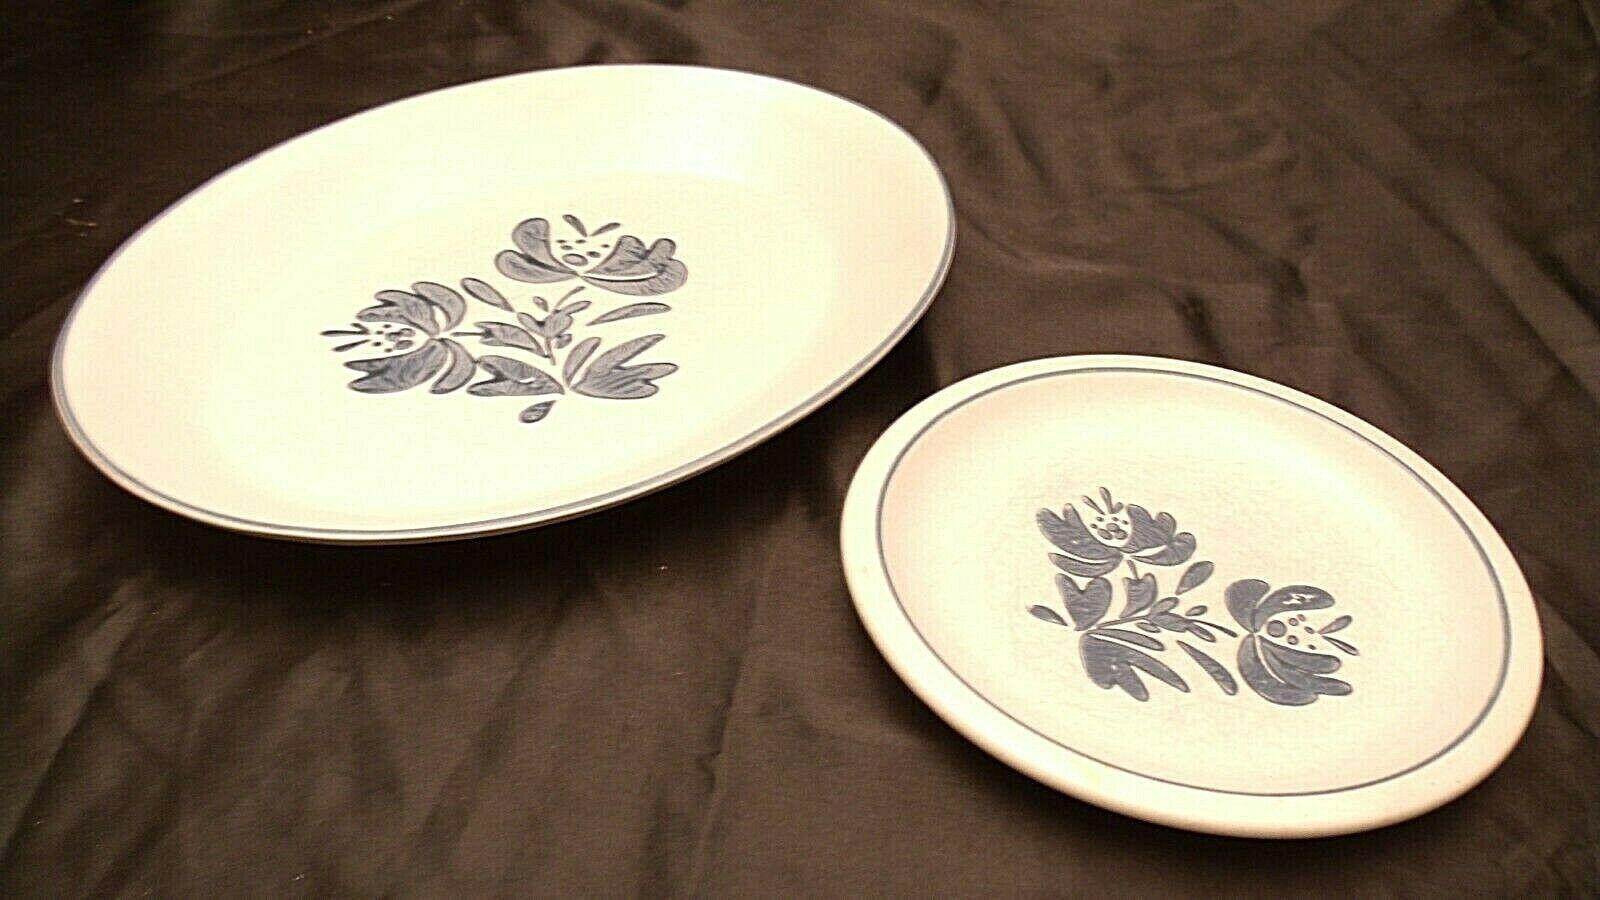 Pfaltzgraff Serving platter No 16 and Salad Plate USA AA20-2131a Vintage